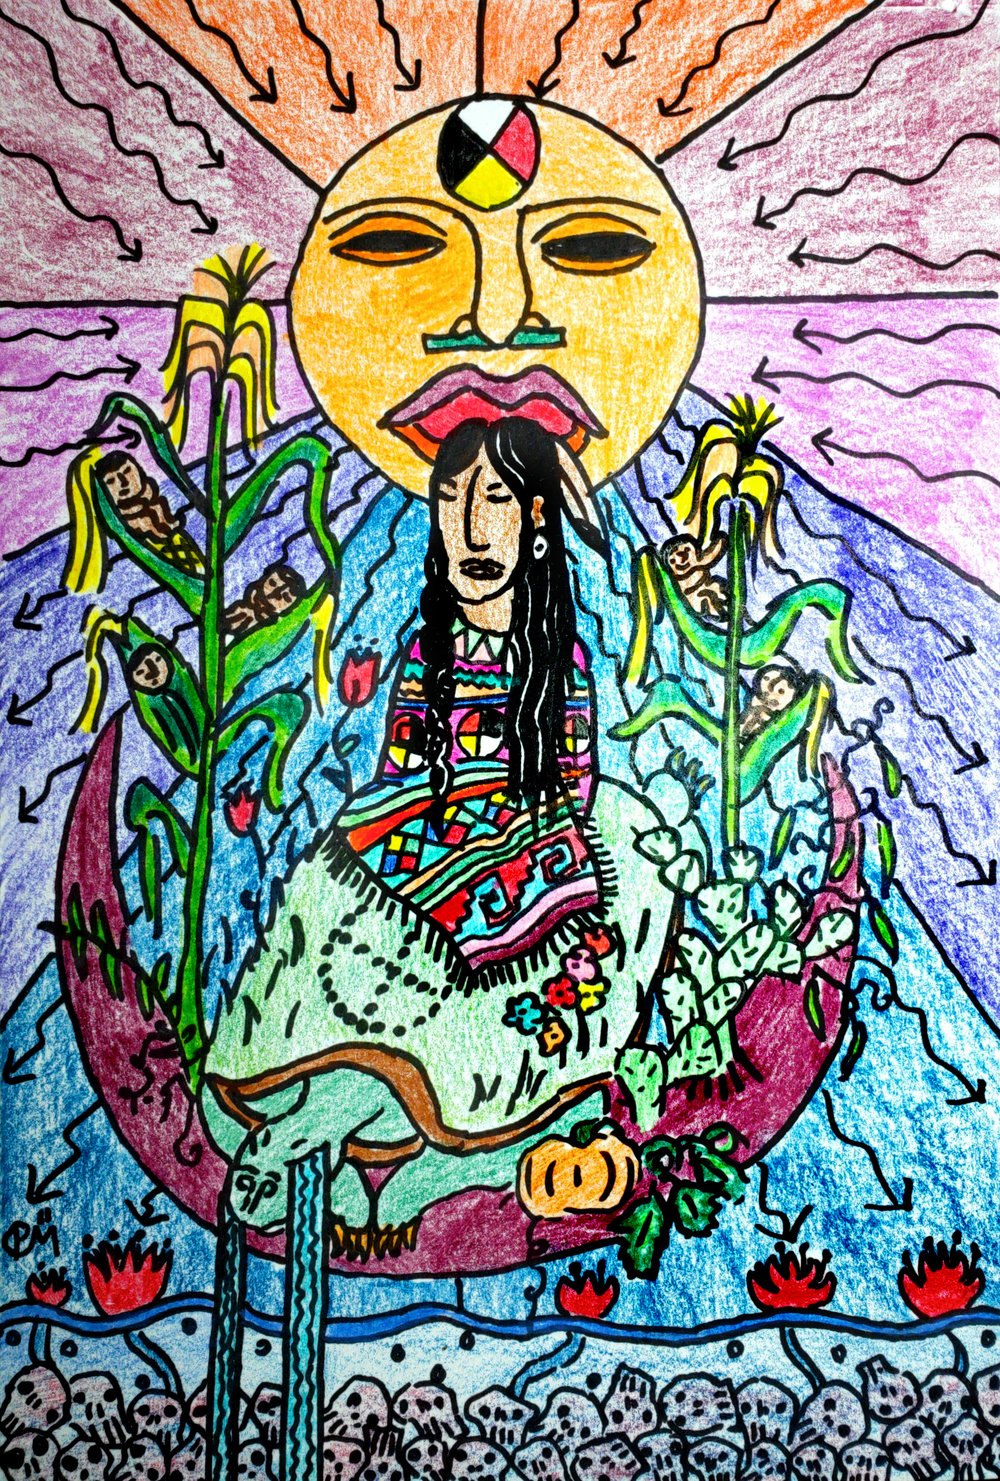 Art by Paulino Mejia